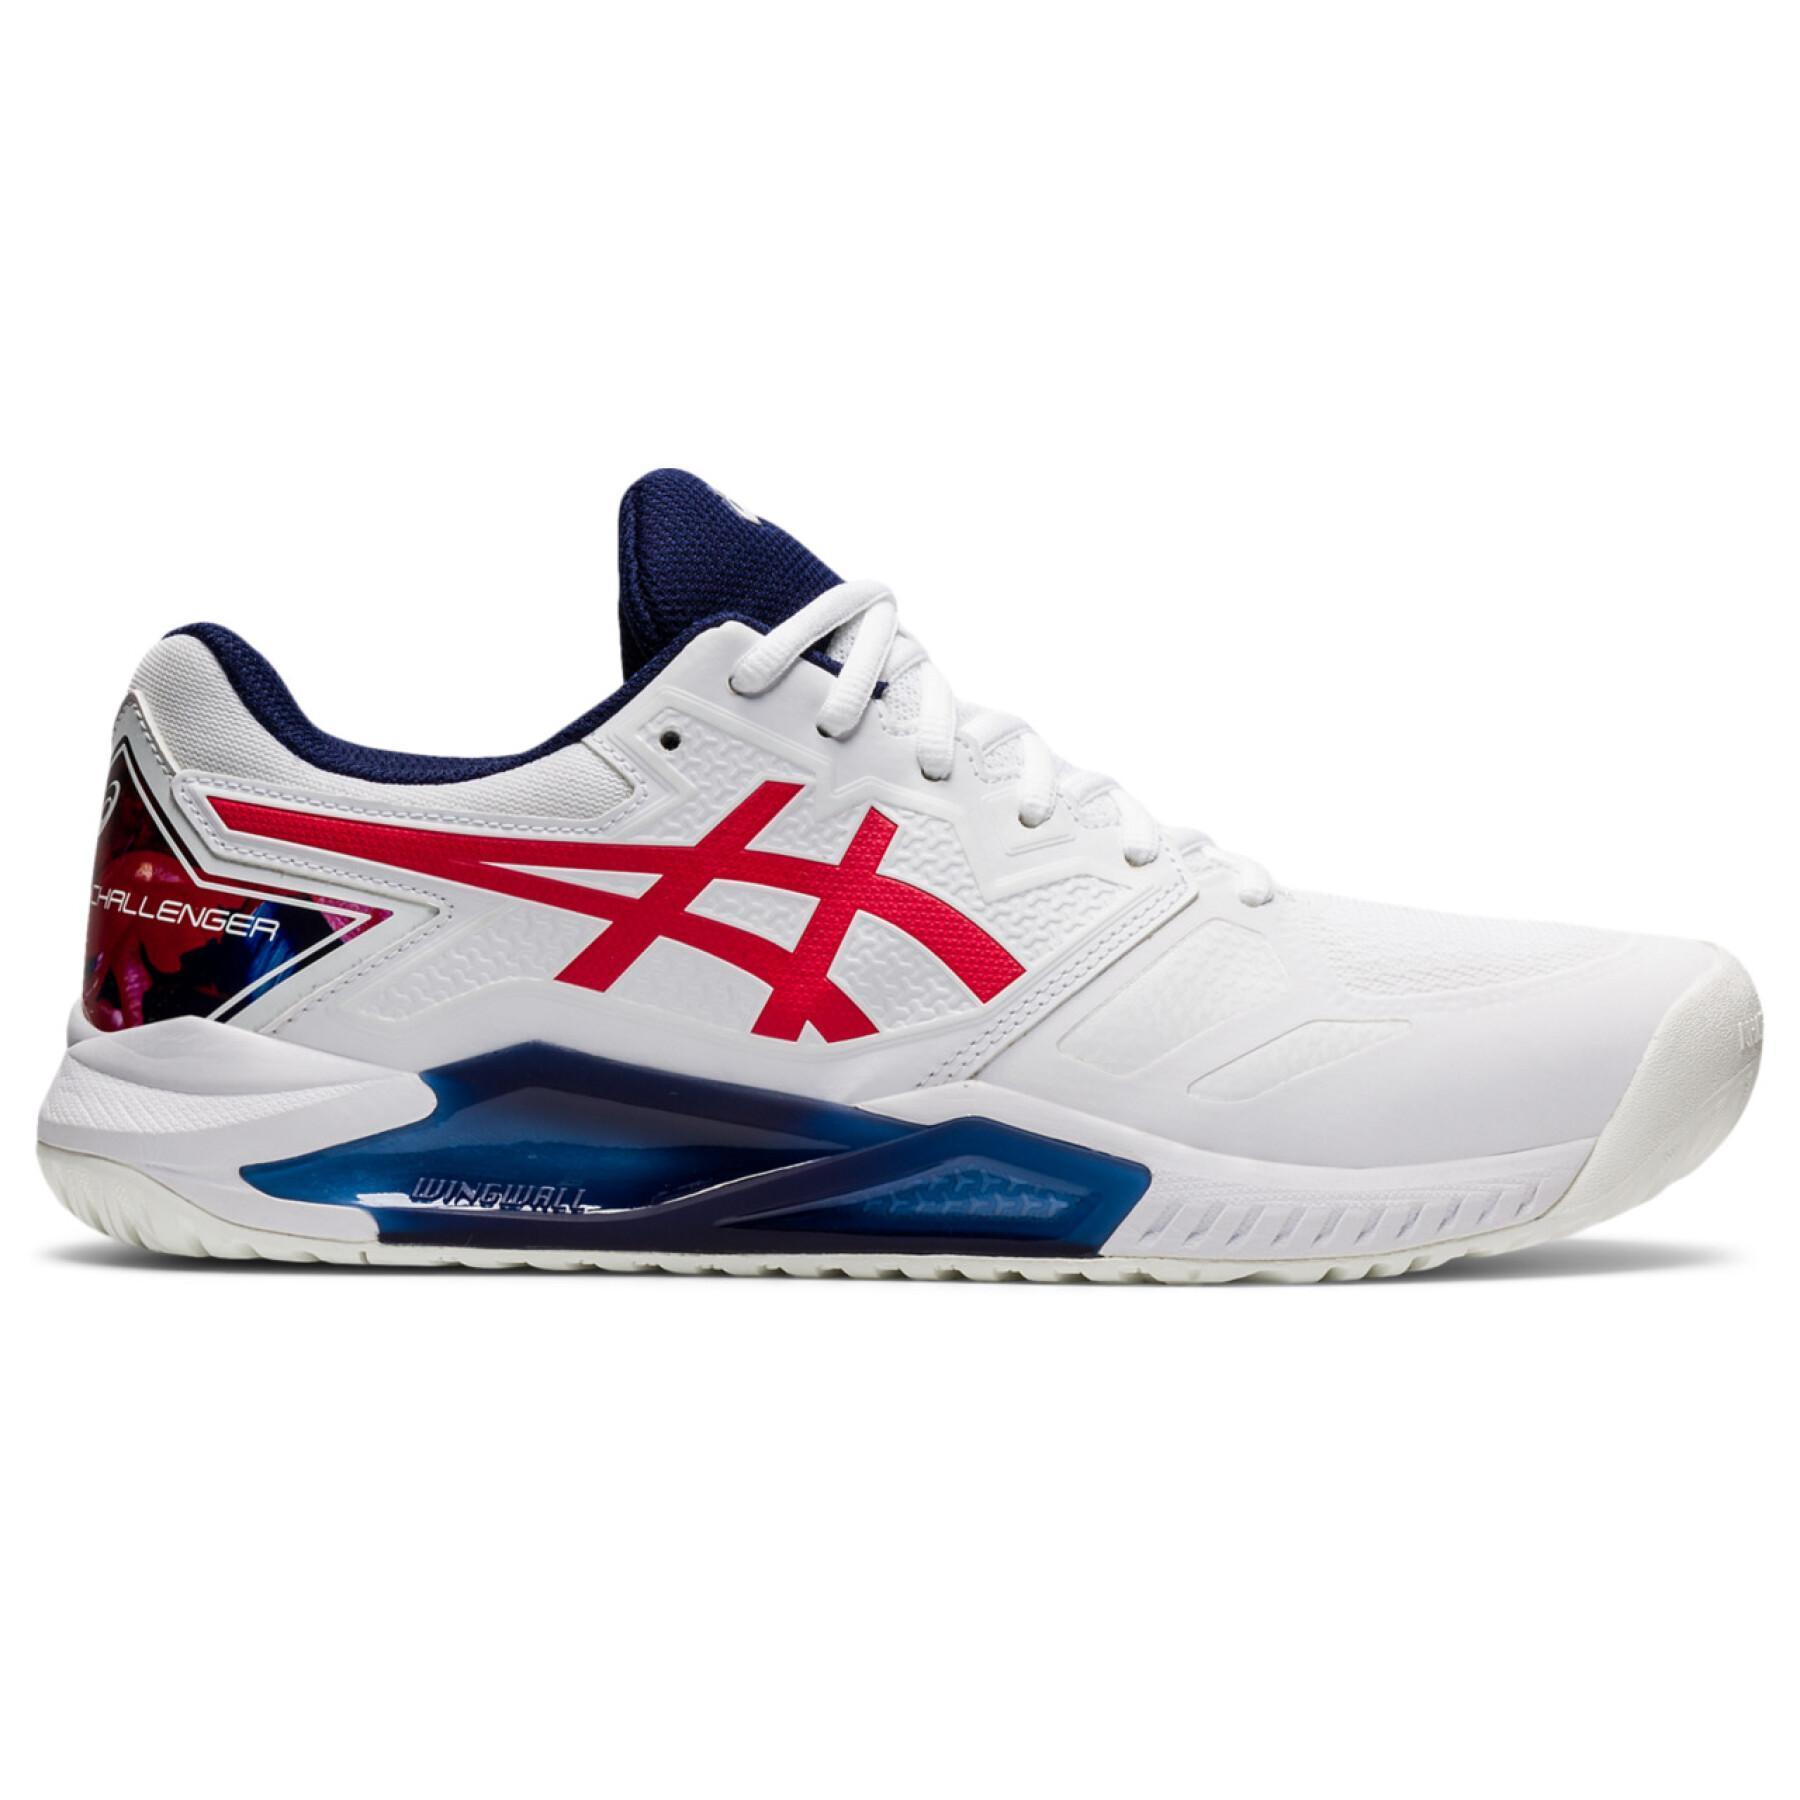 Shoes Asics Gel-Challenger 13 L.e.